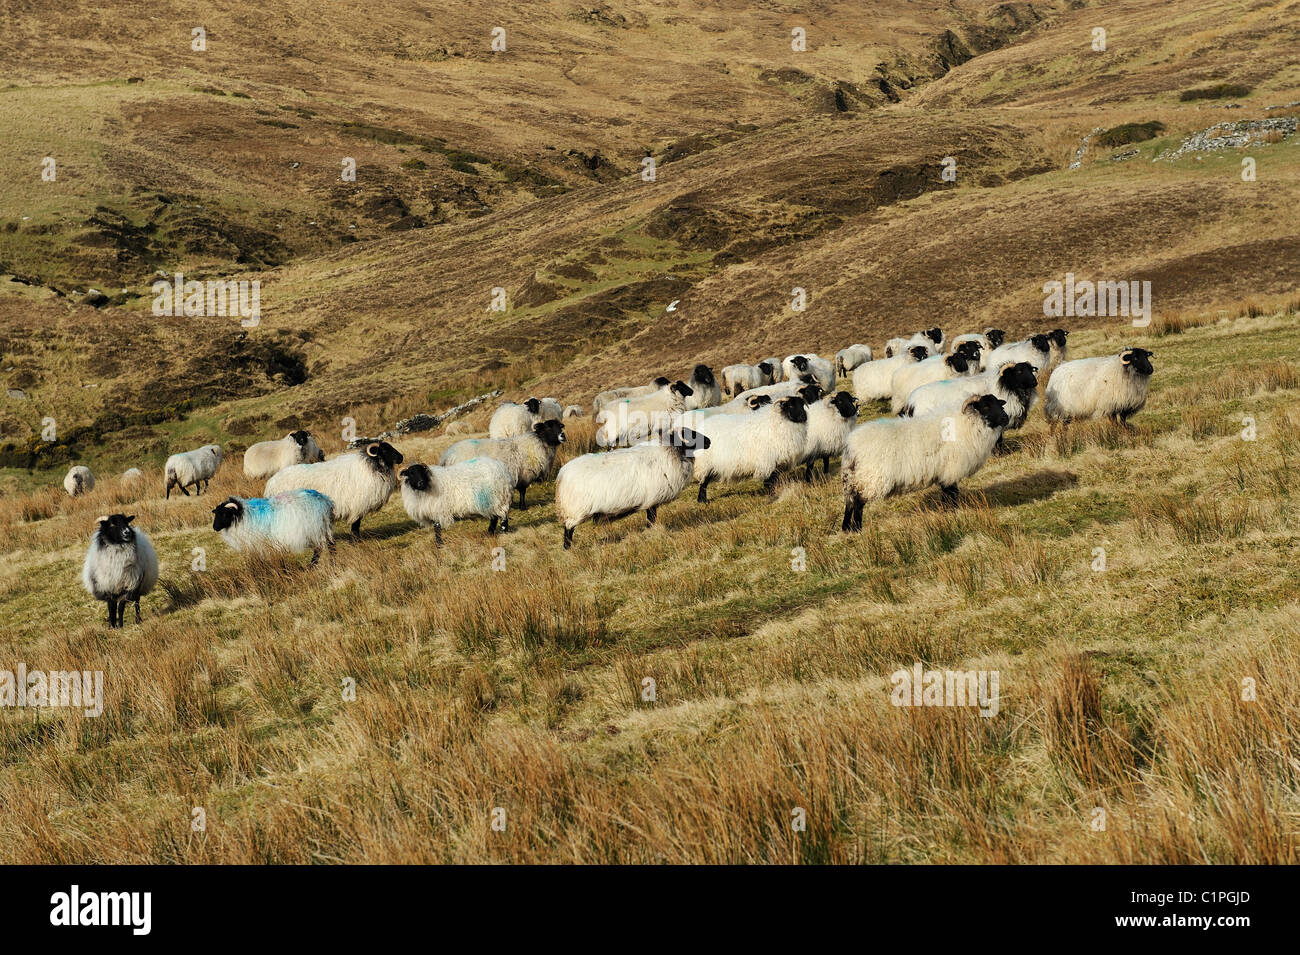 Mountain sheep grazing on a hillside in Achill Island Co.Mayo Ireland - Stock Image